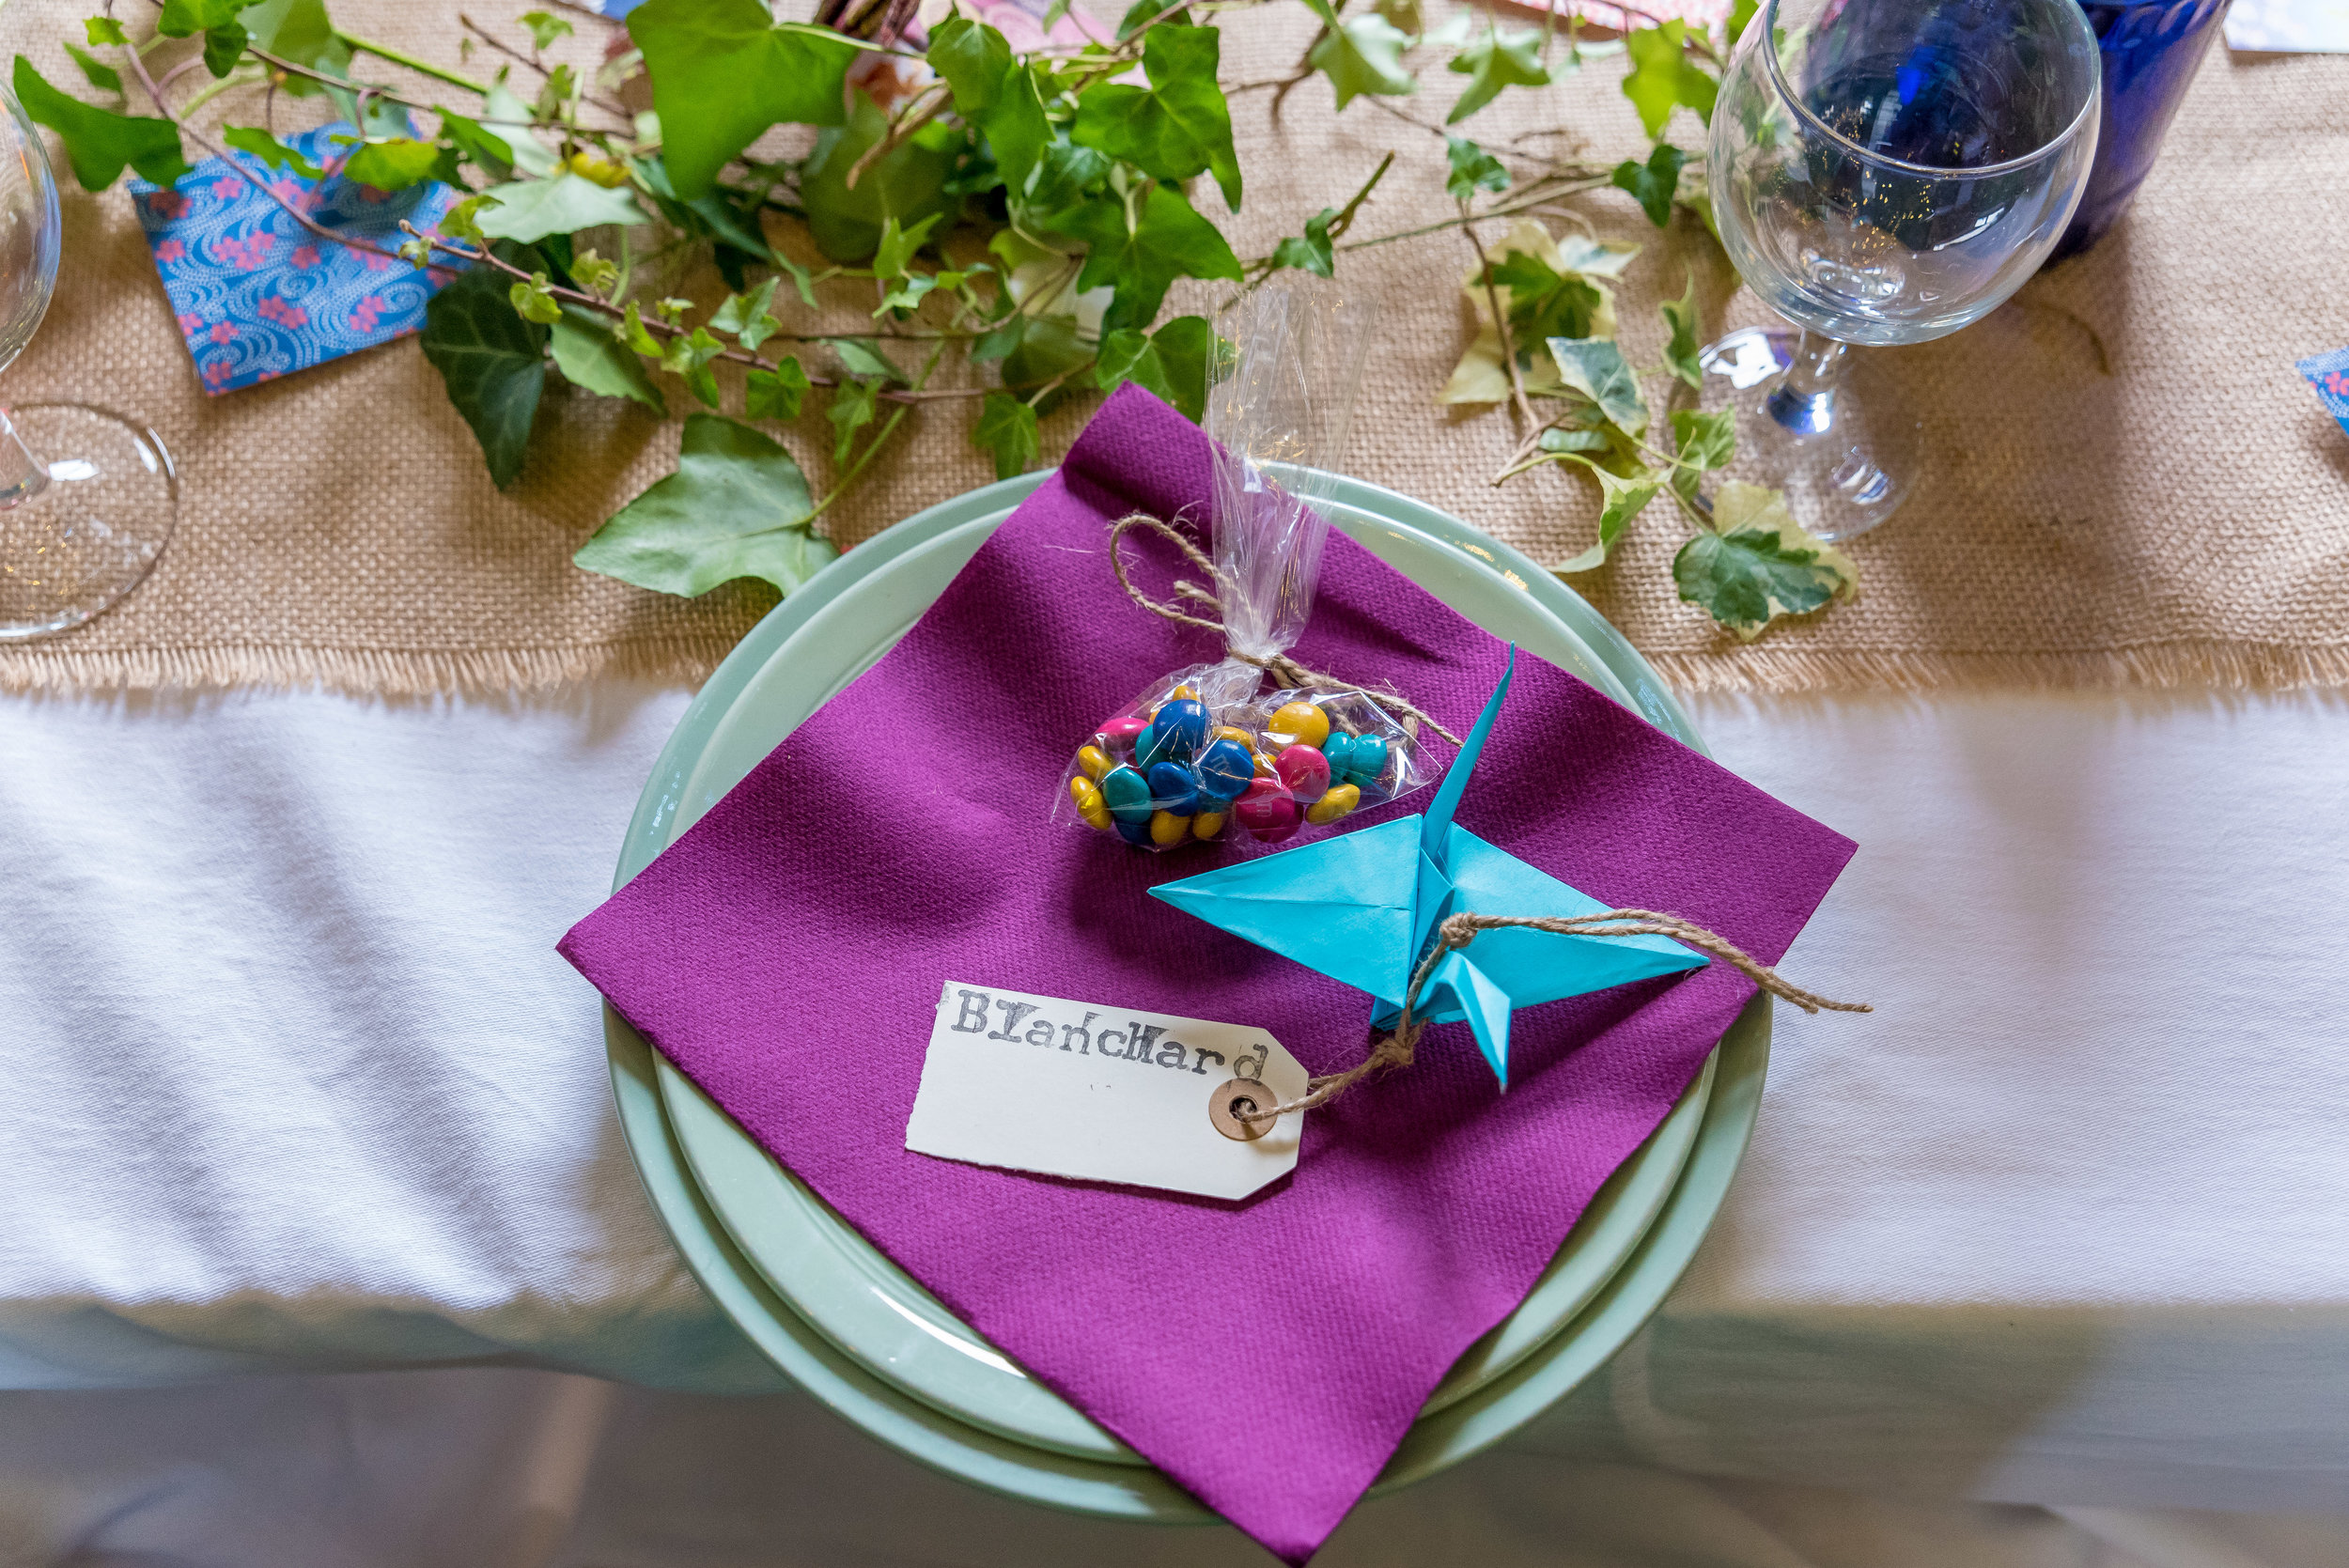 Hampshire-Village-Hall-Wedding-Venue / Sarah-Fishlock-Photography / Fleet-Hampshire-Wedding-Photographer / Surrey-village-hall-wedding / Village-Hall-Wedding-Ideas-Inspiration / Village-fete-wedding